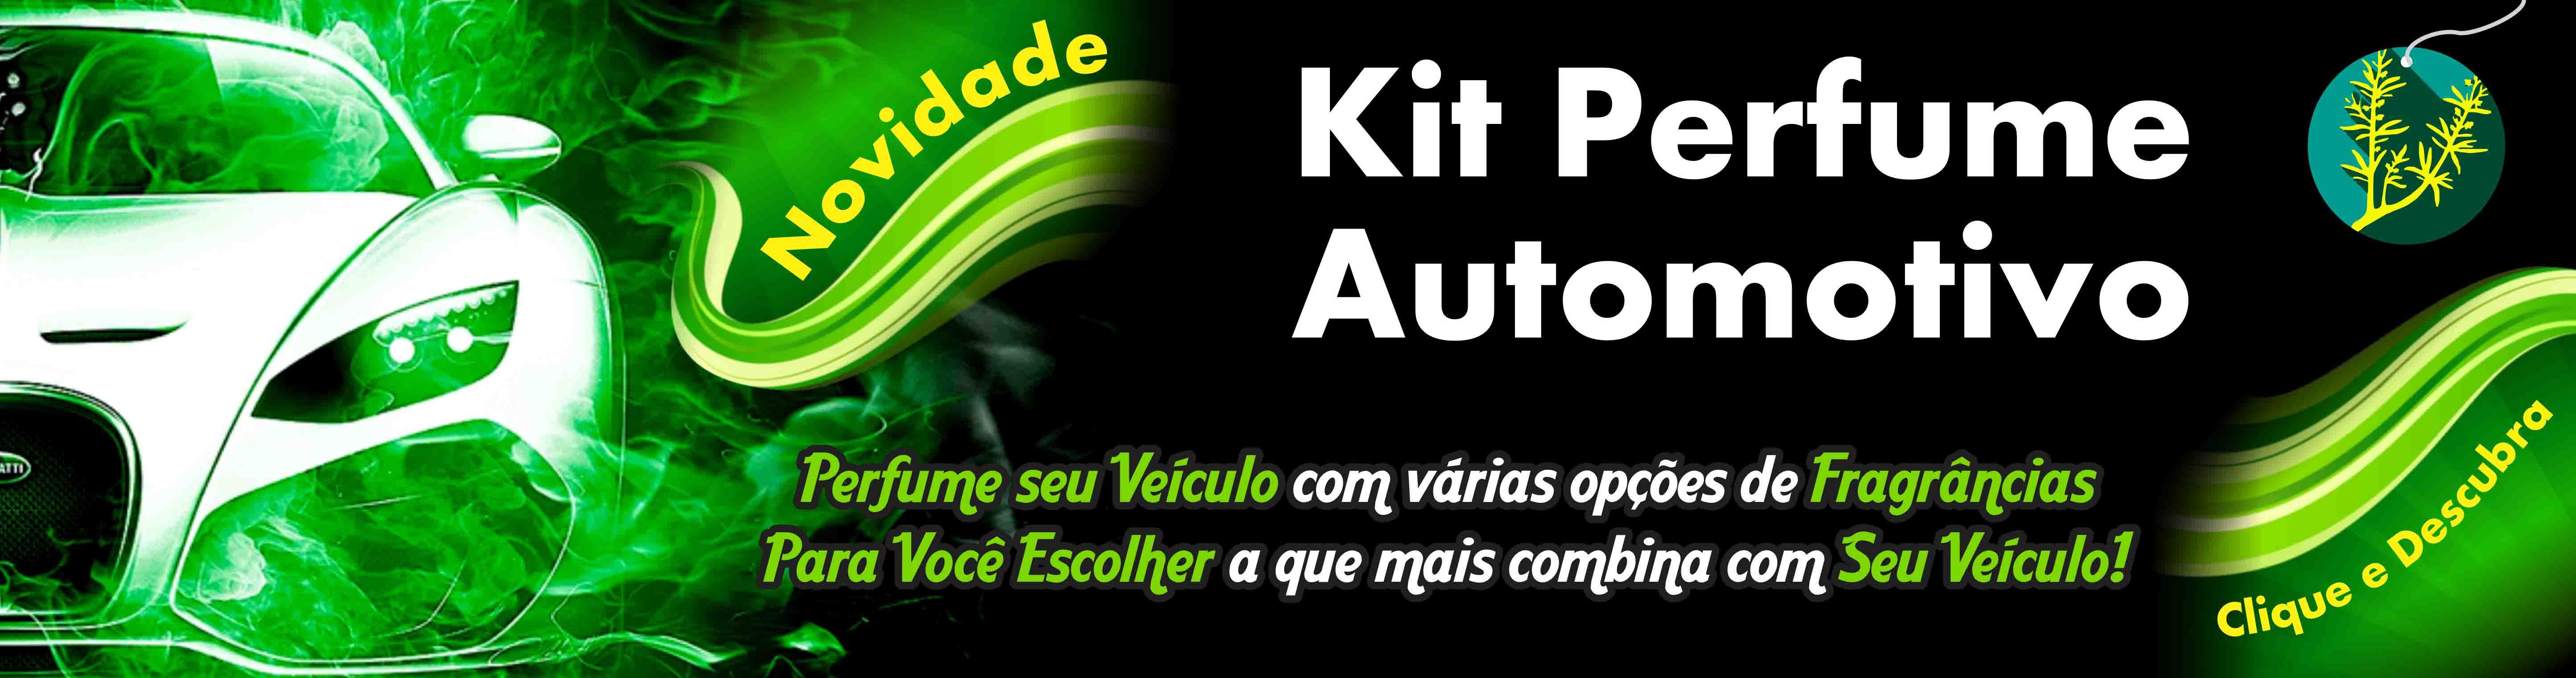 Kit Perfume Automotivo